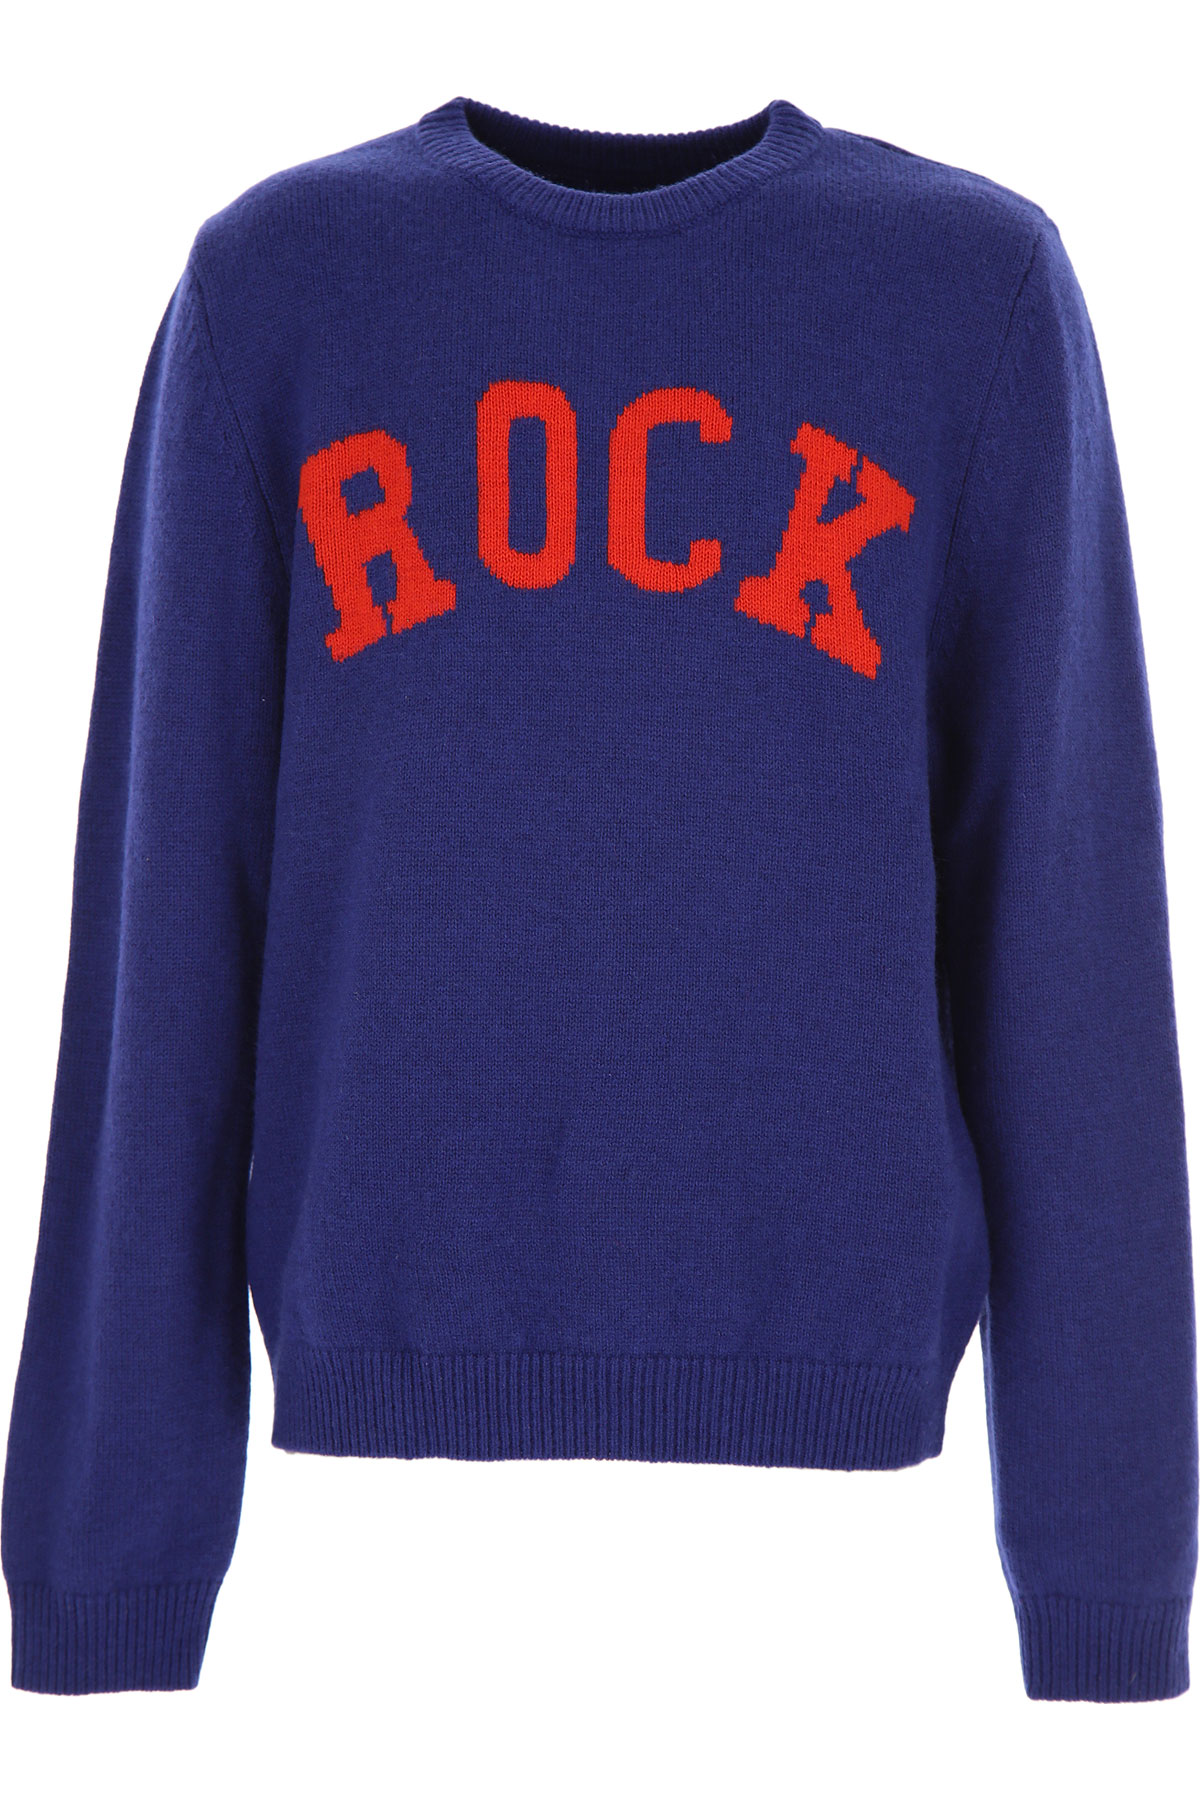 Zadig & Voltaire Kids Sweaters for Boys On Sale, Blu, Wool, 2019, 10Y 12Y 14Y 16Y 8Y